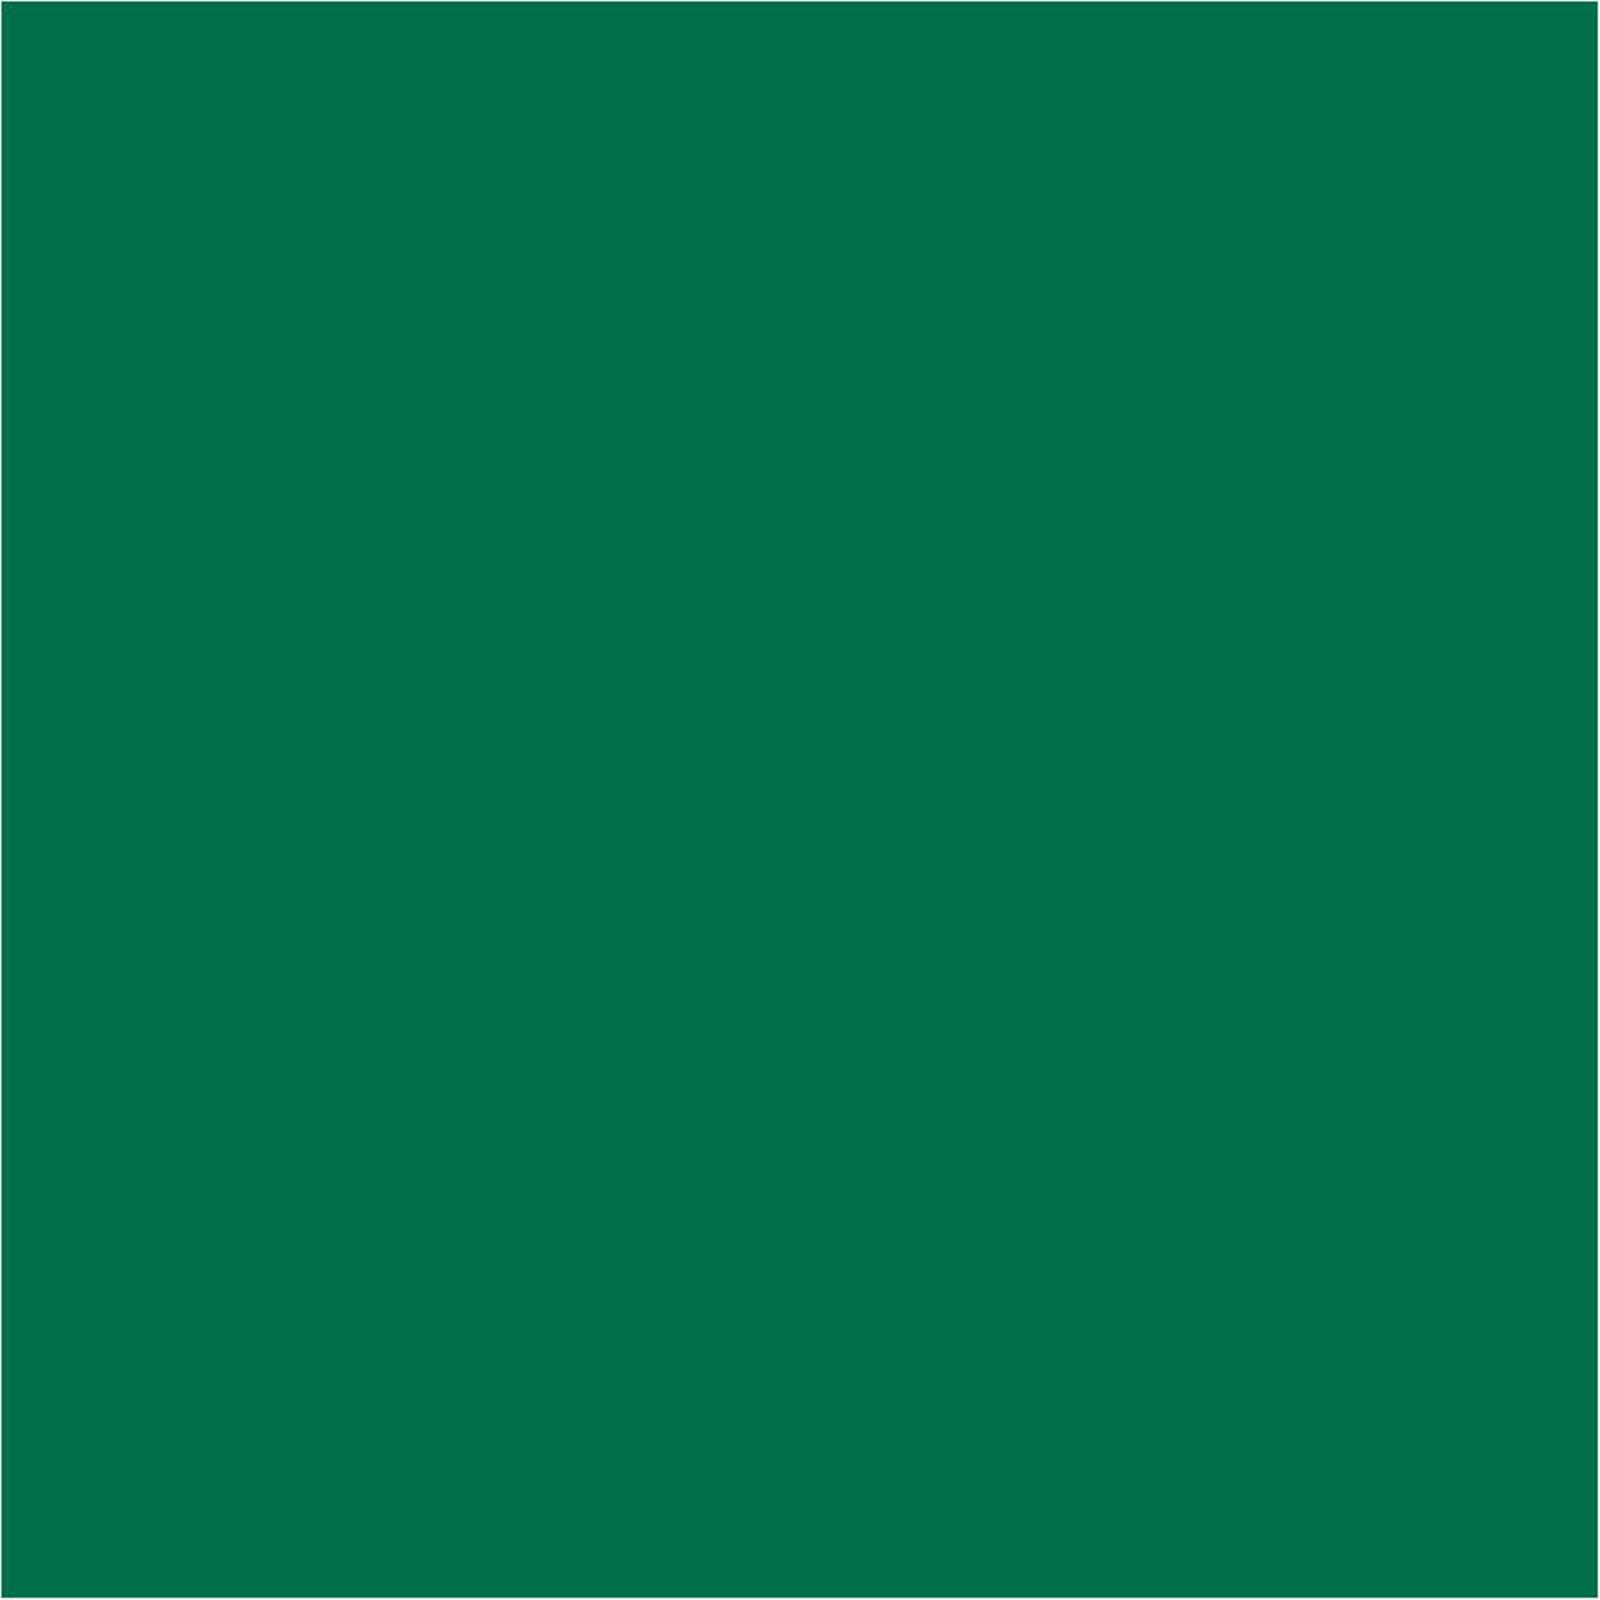 verde ftalocianin